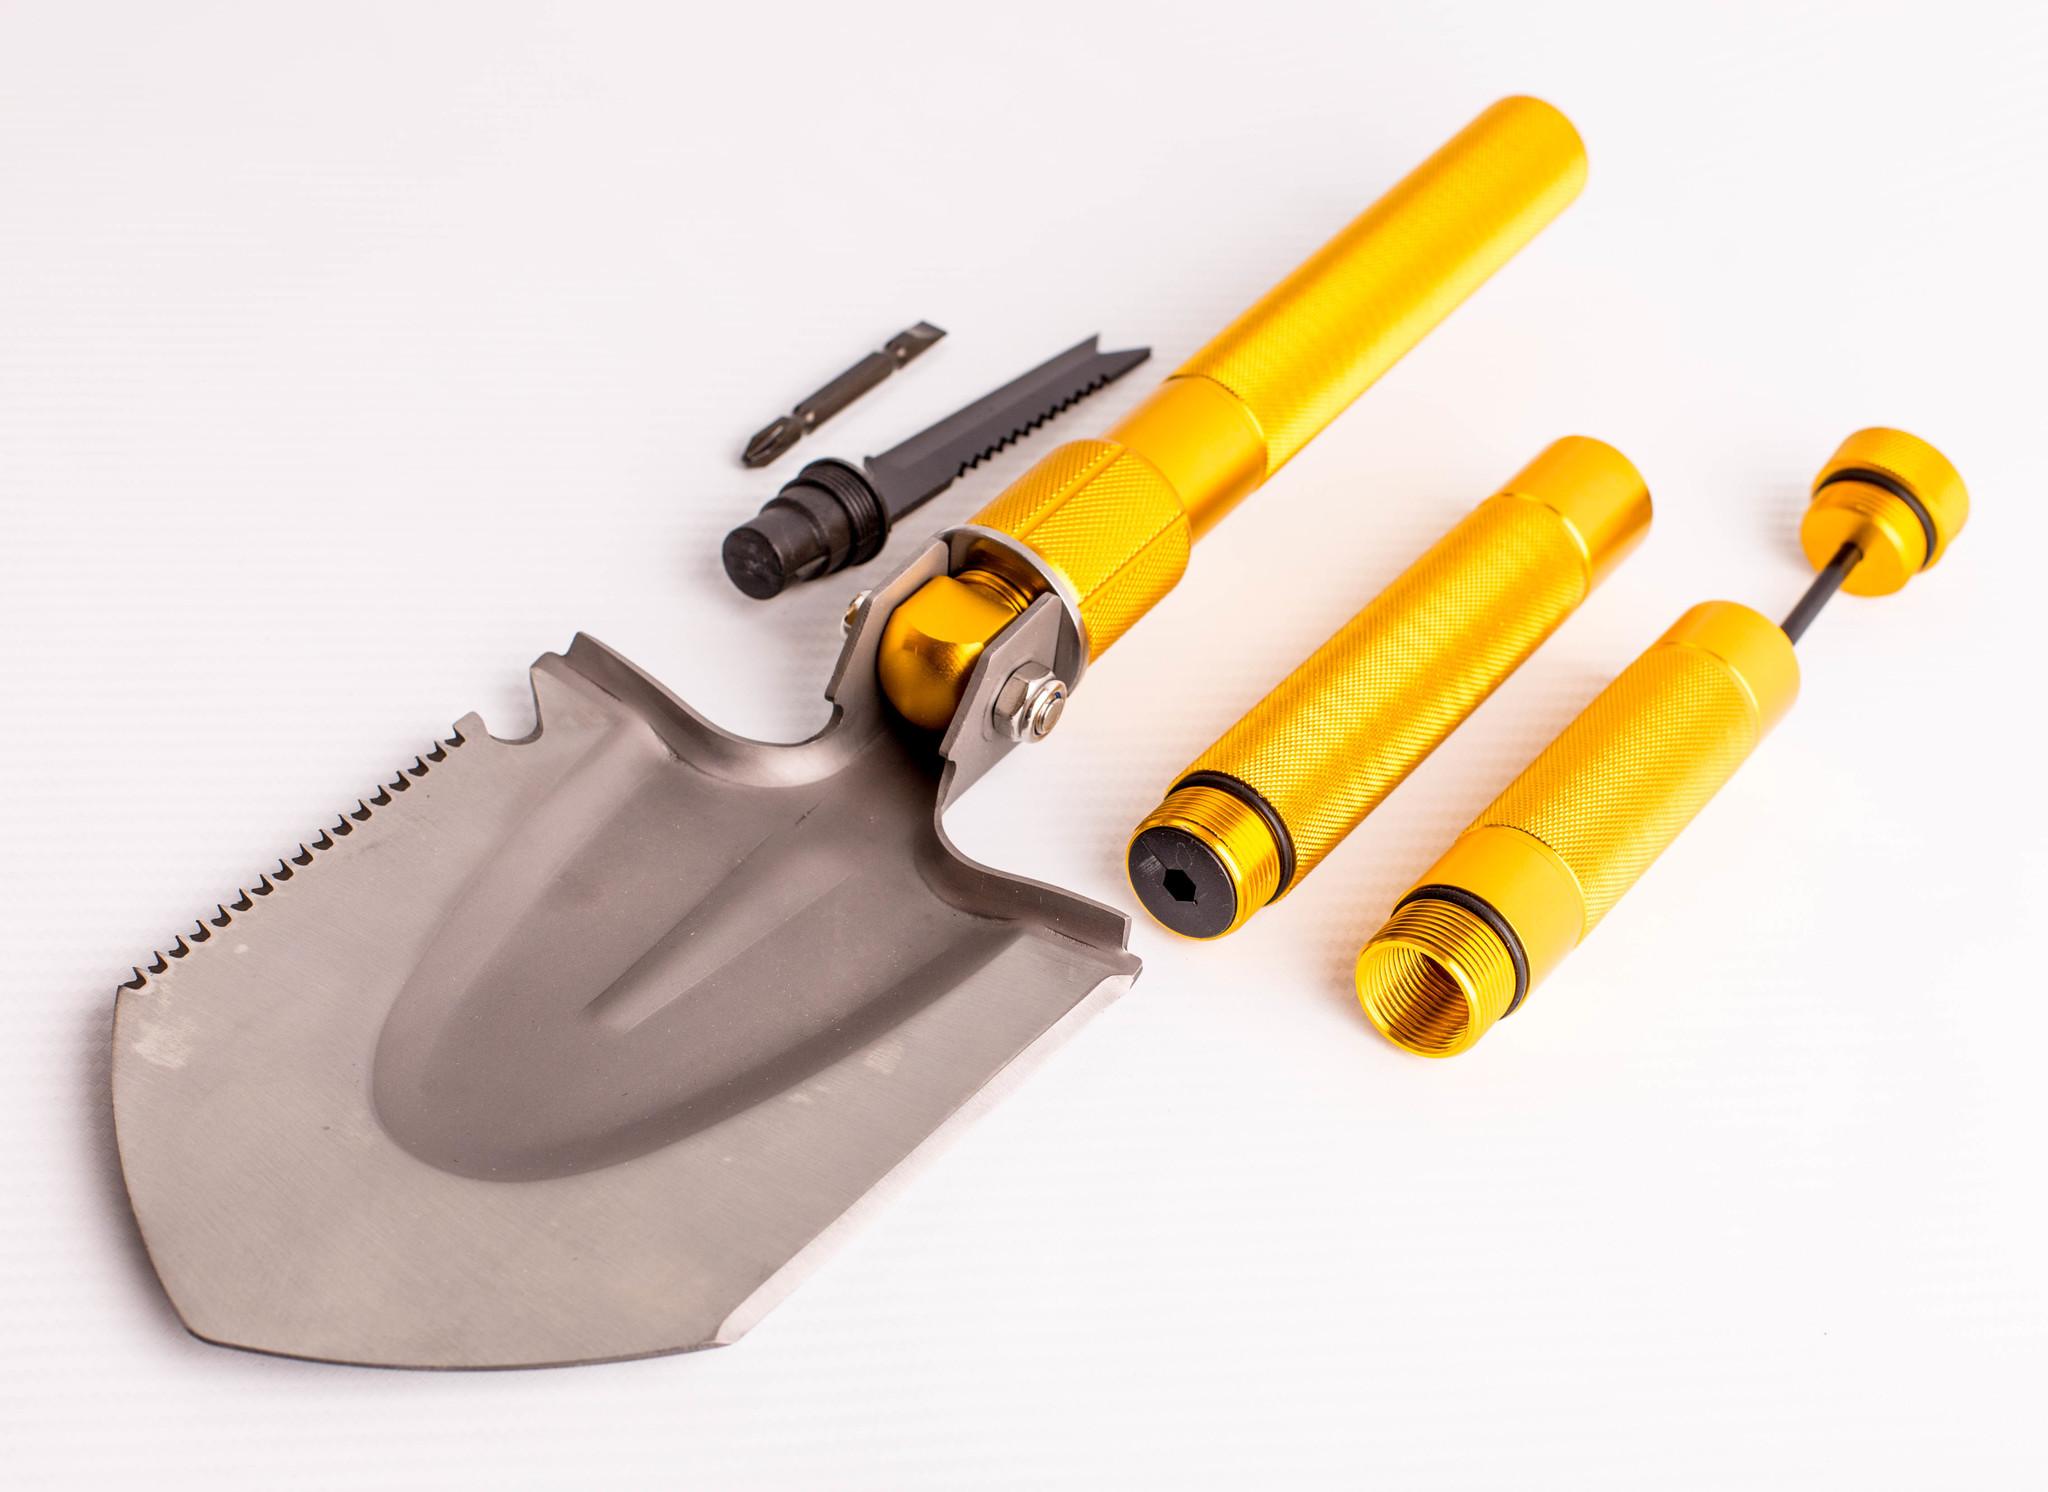 Фото 18 - Многофункциональная лопата, золотистая рукоятка от Noname